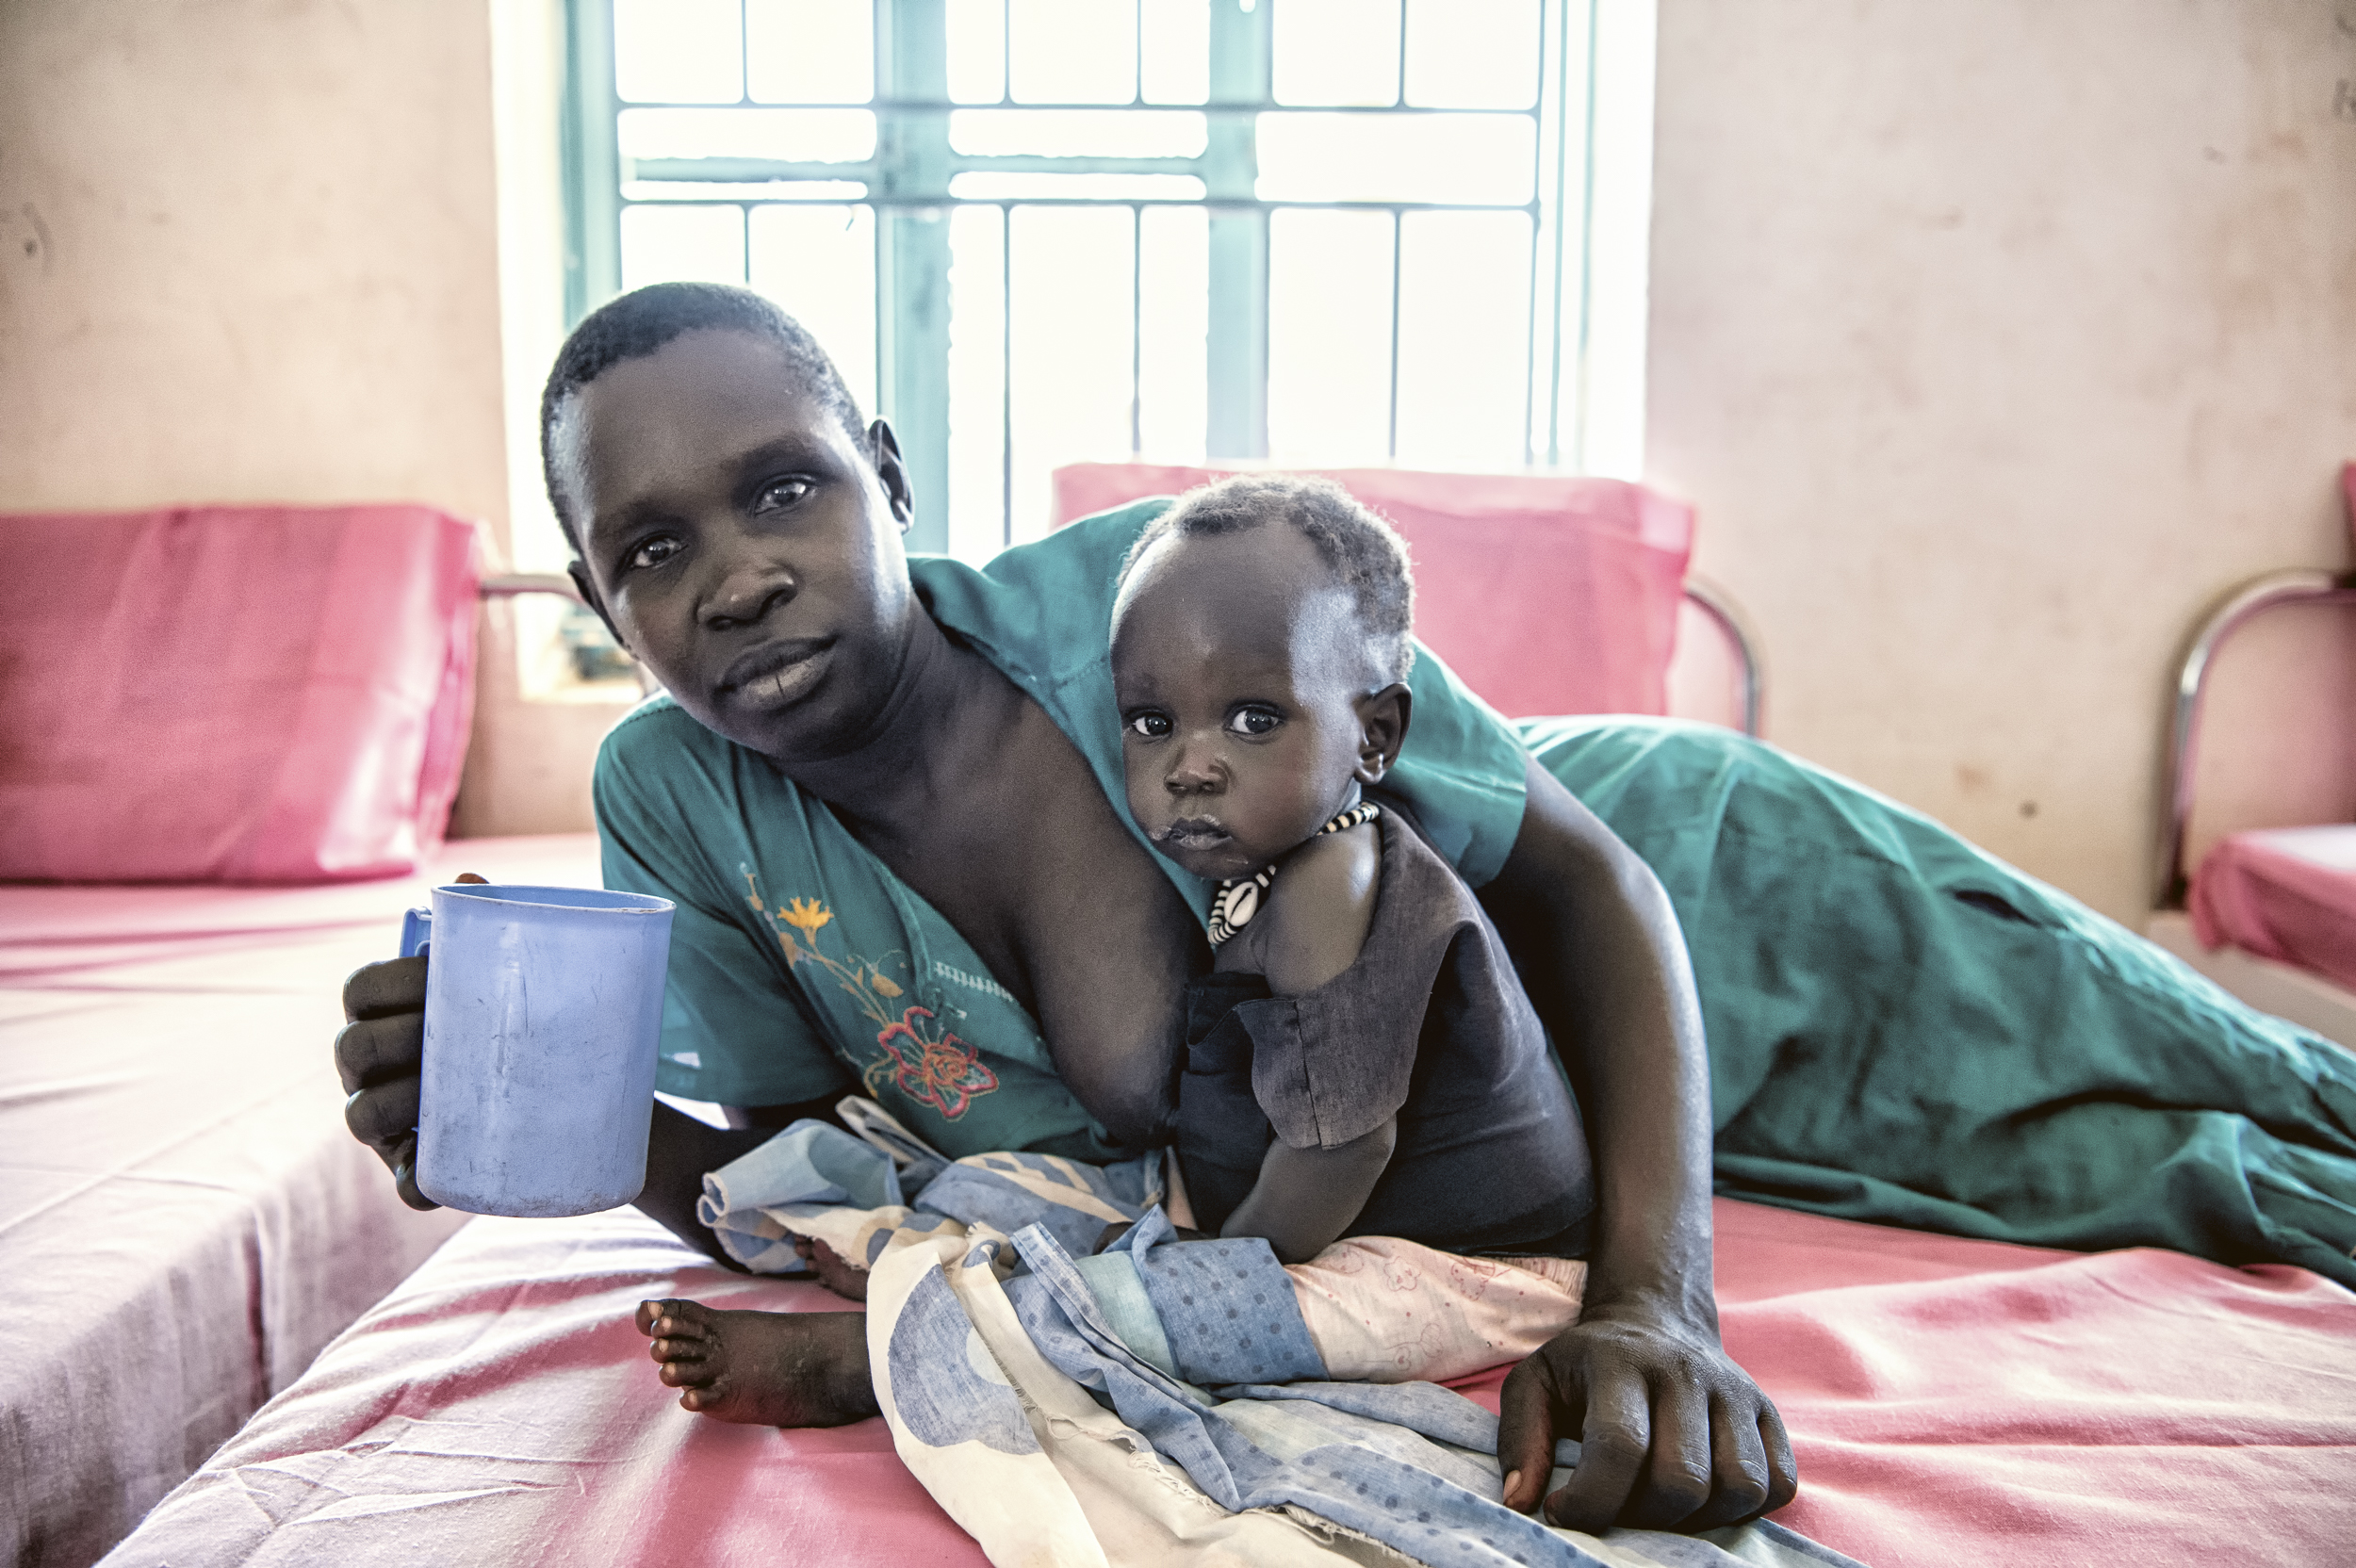 AE_SS16_UNICEF__8931-Edit-Edit-Edit.jpg